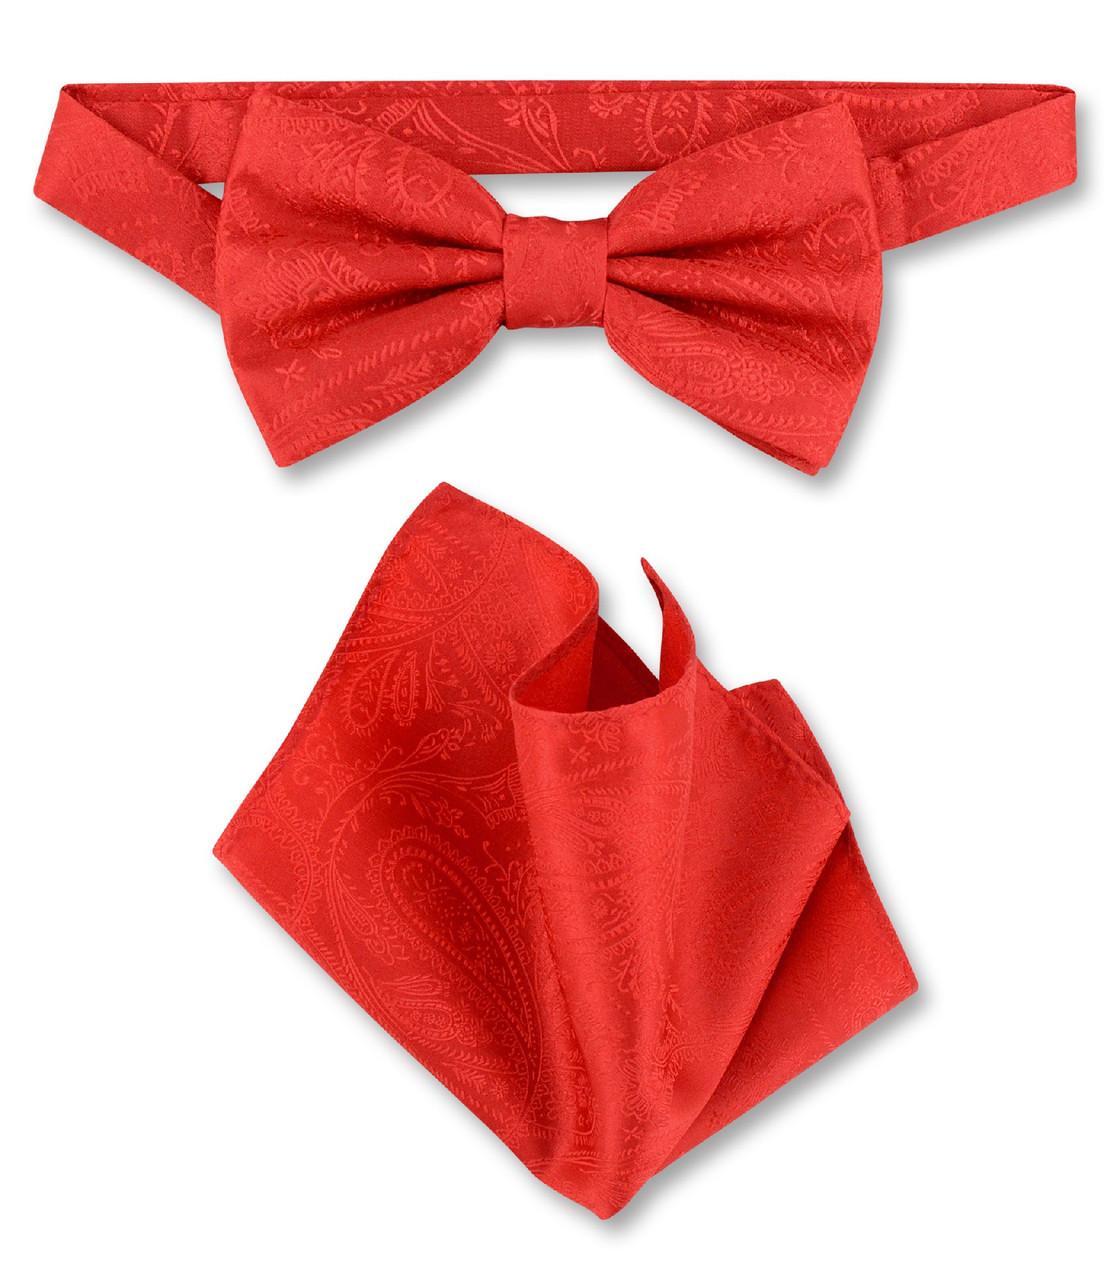 New Men/'s 100/% Polyester Solid Formal Self-tied Bow Tie /& hankie set burgundy